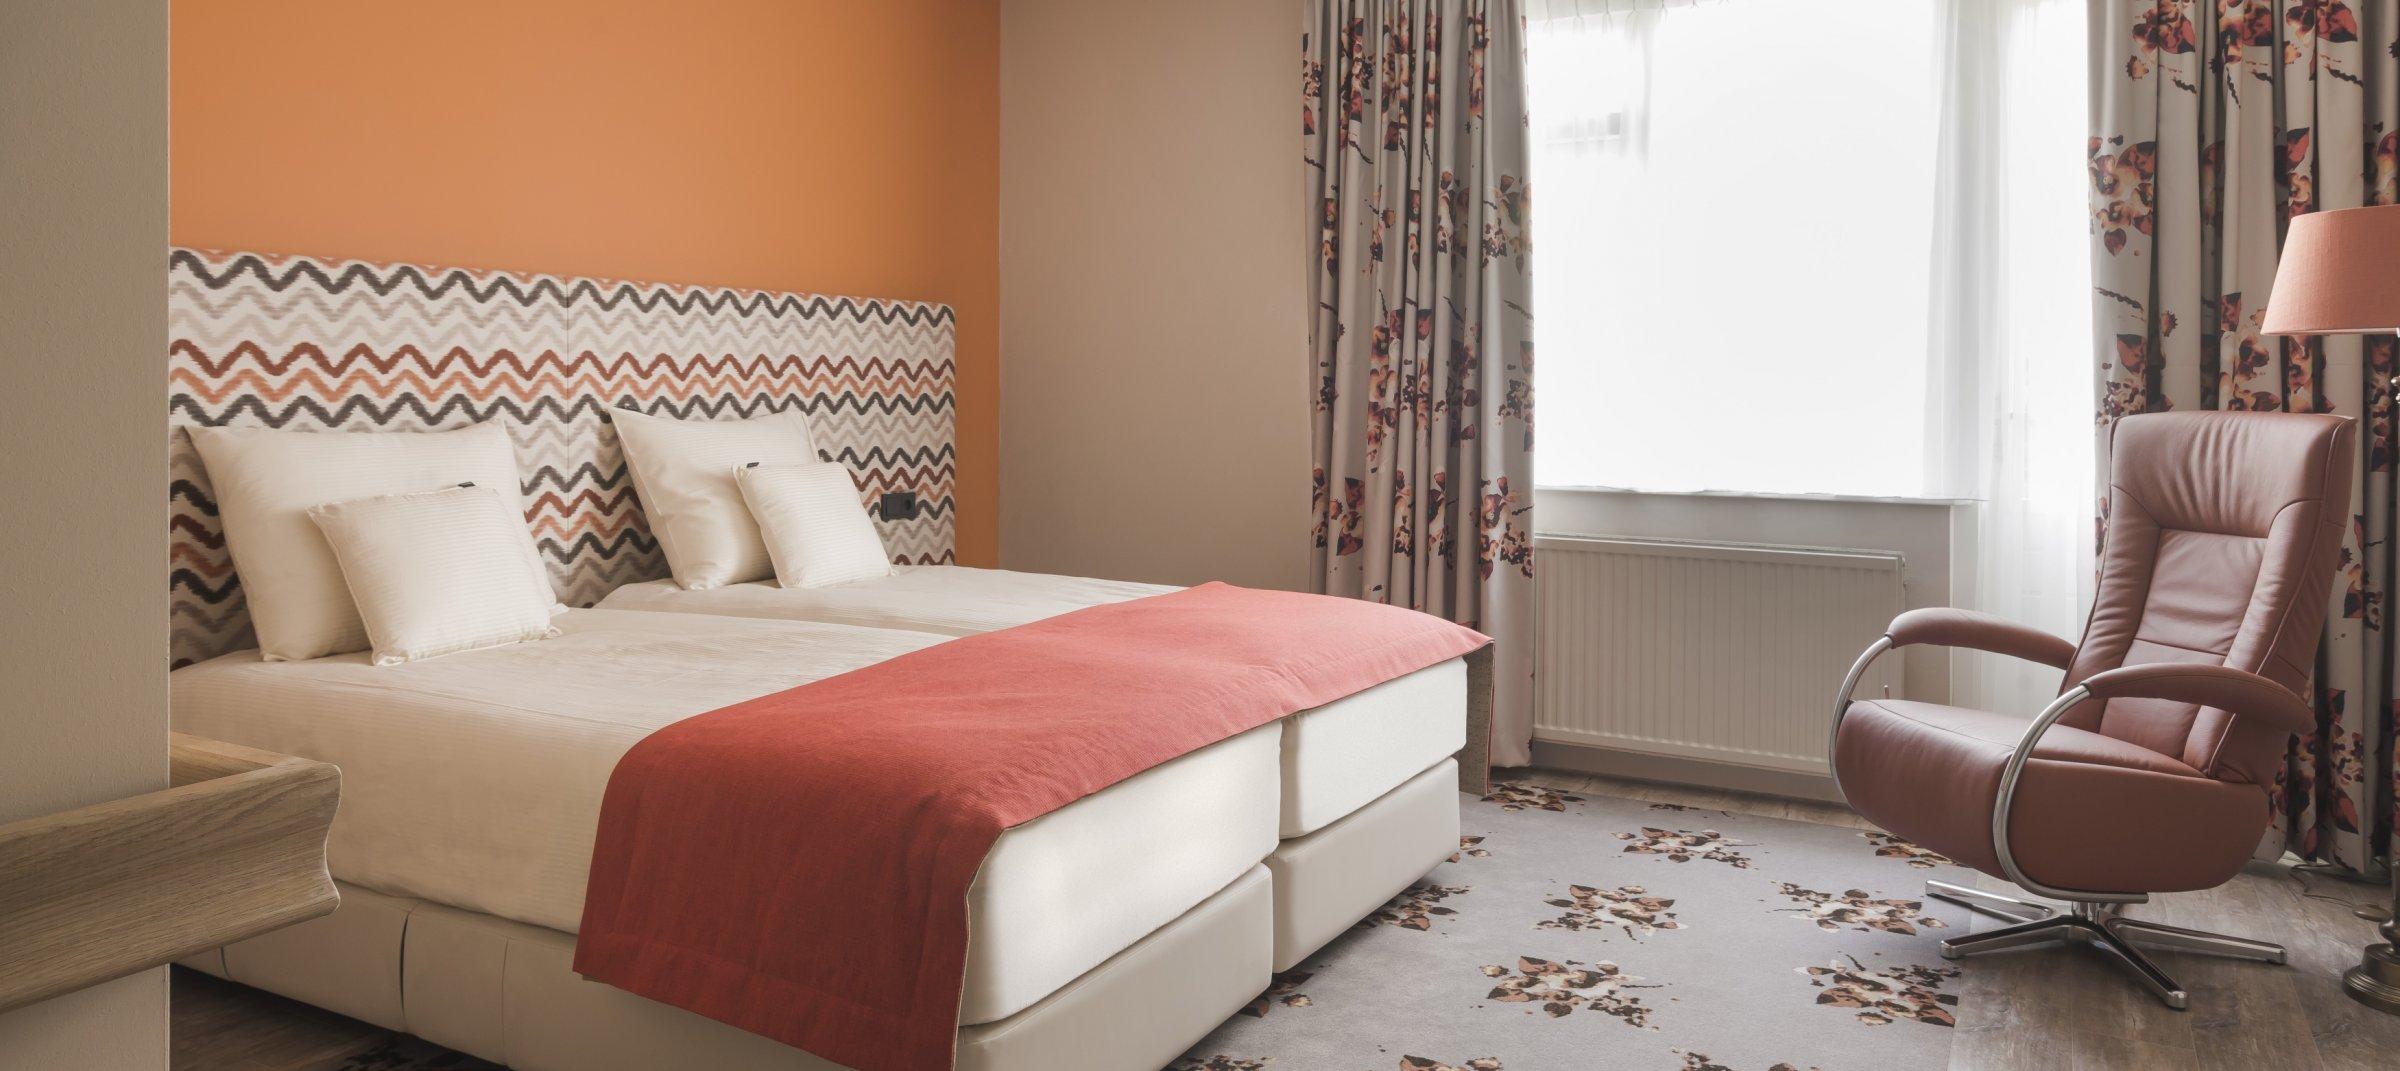 Het hotel in Nunspeet